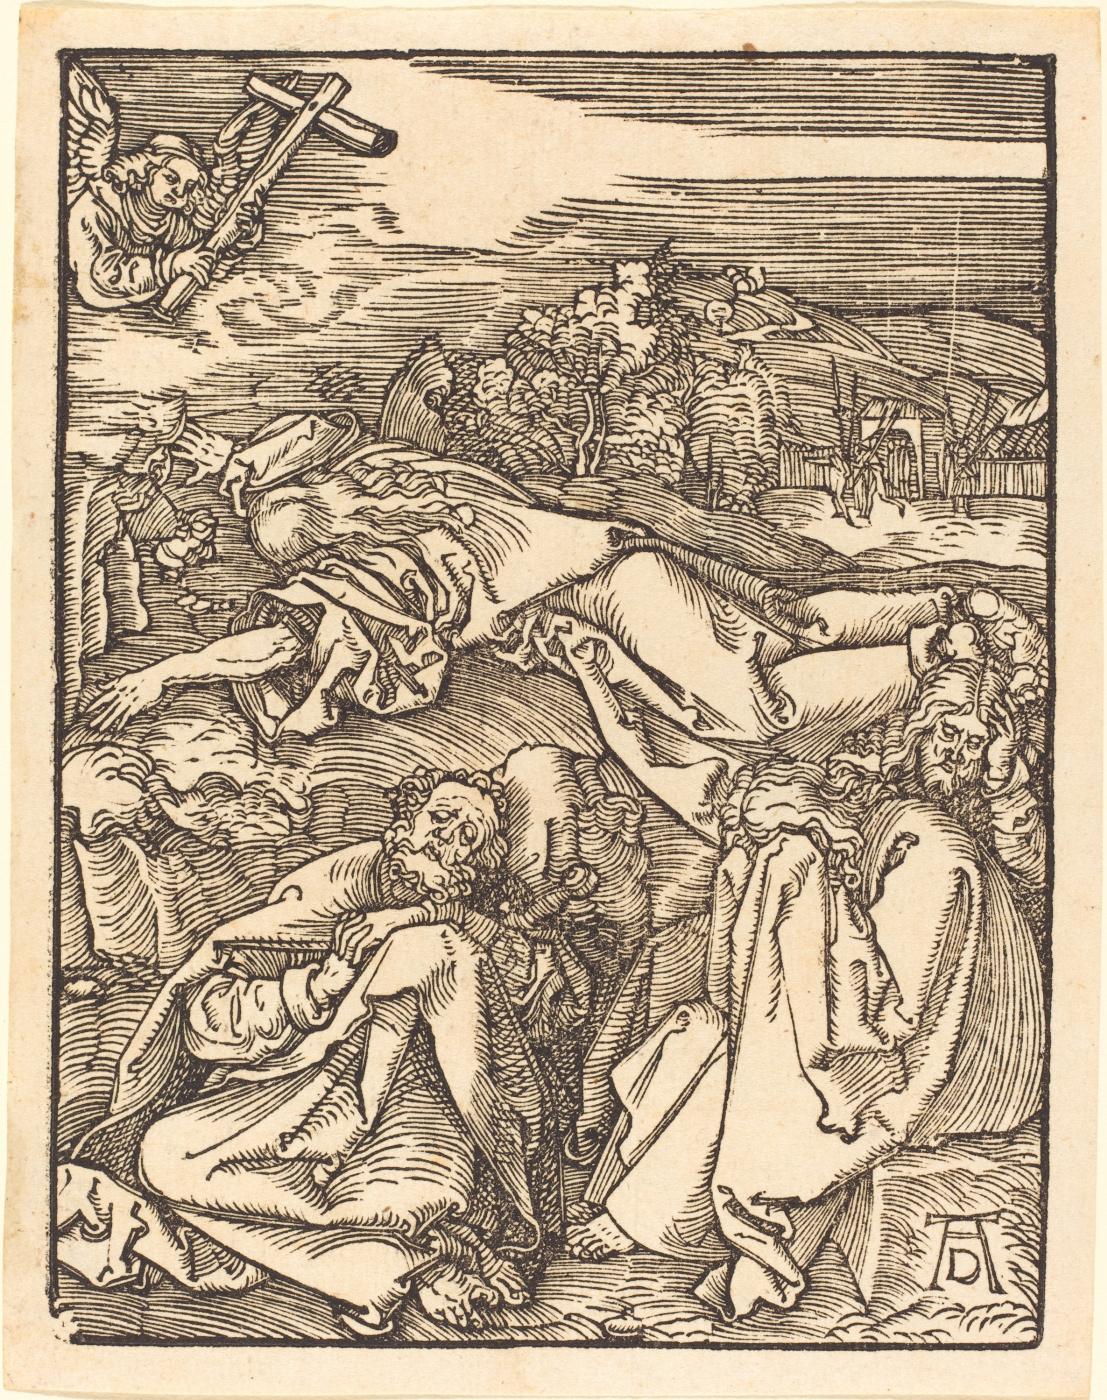 Albrecht Durer. Christ on the mount of olives. Agony in the garden